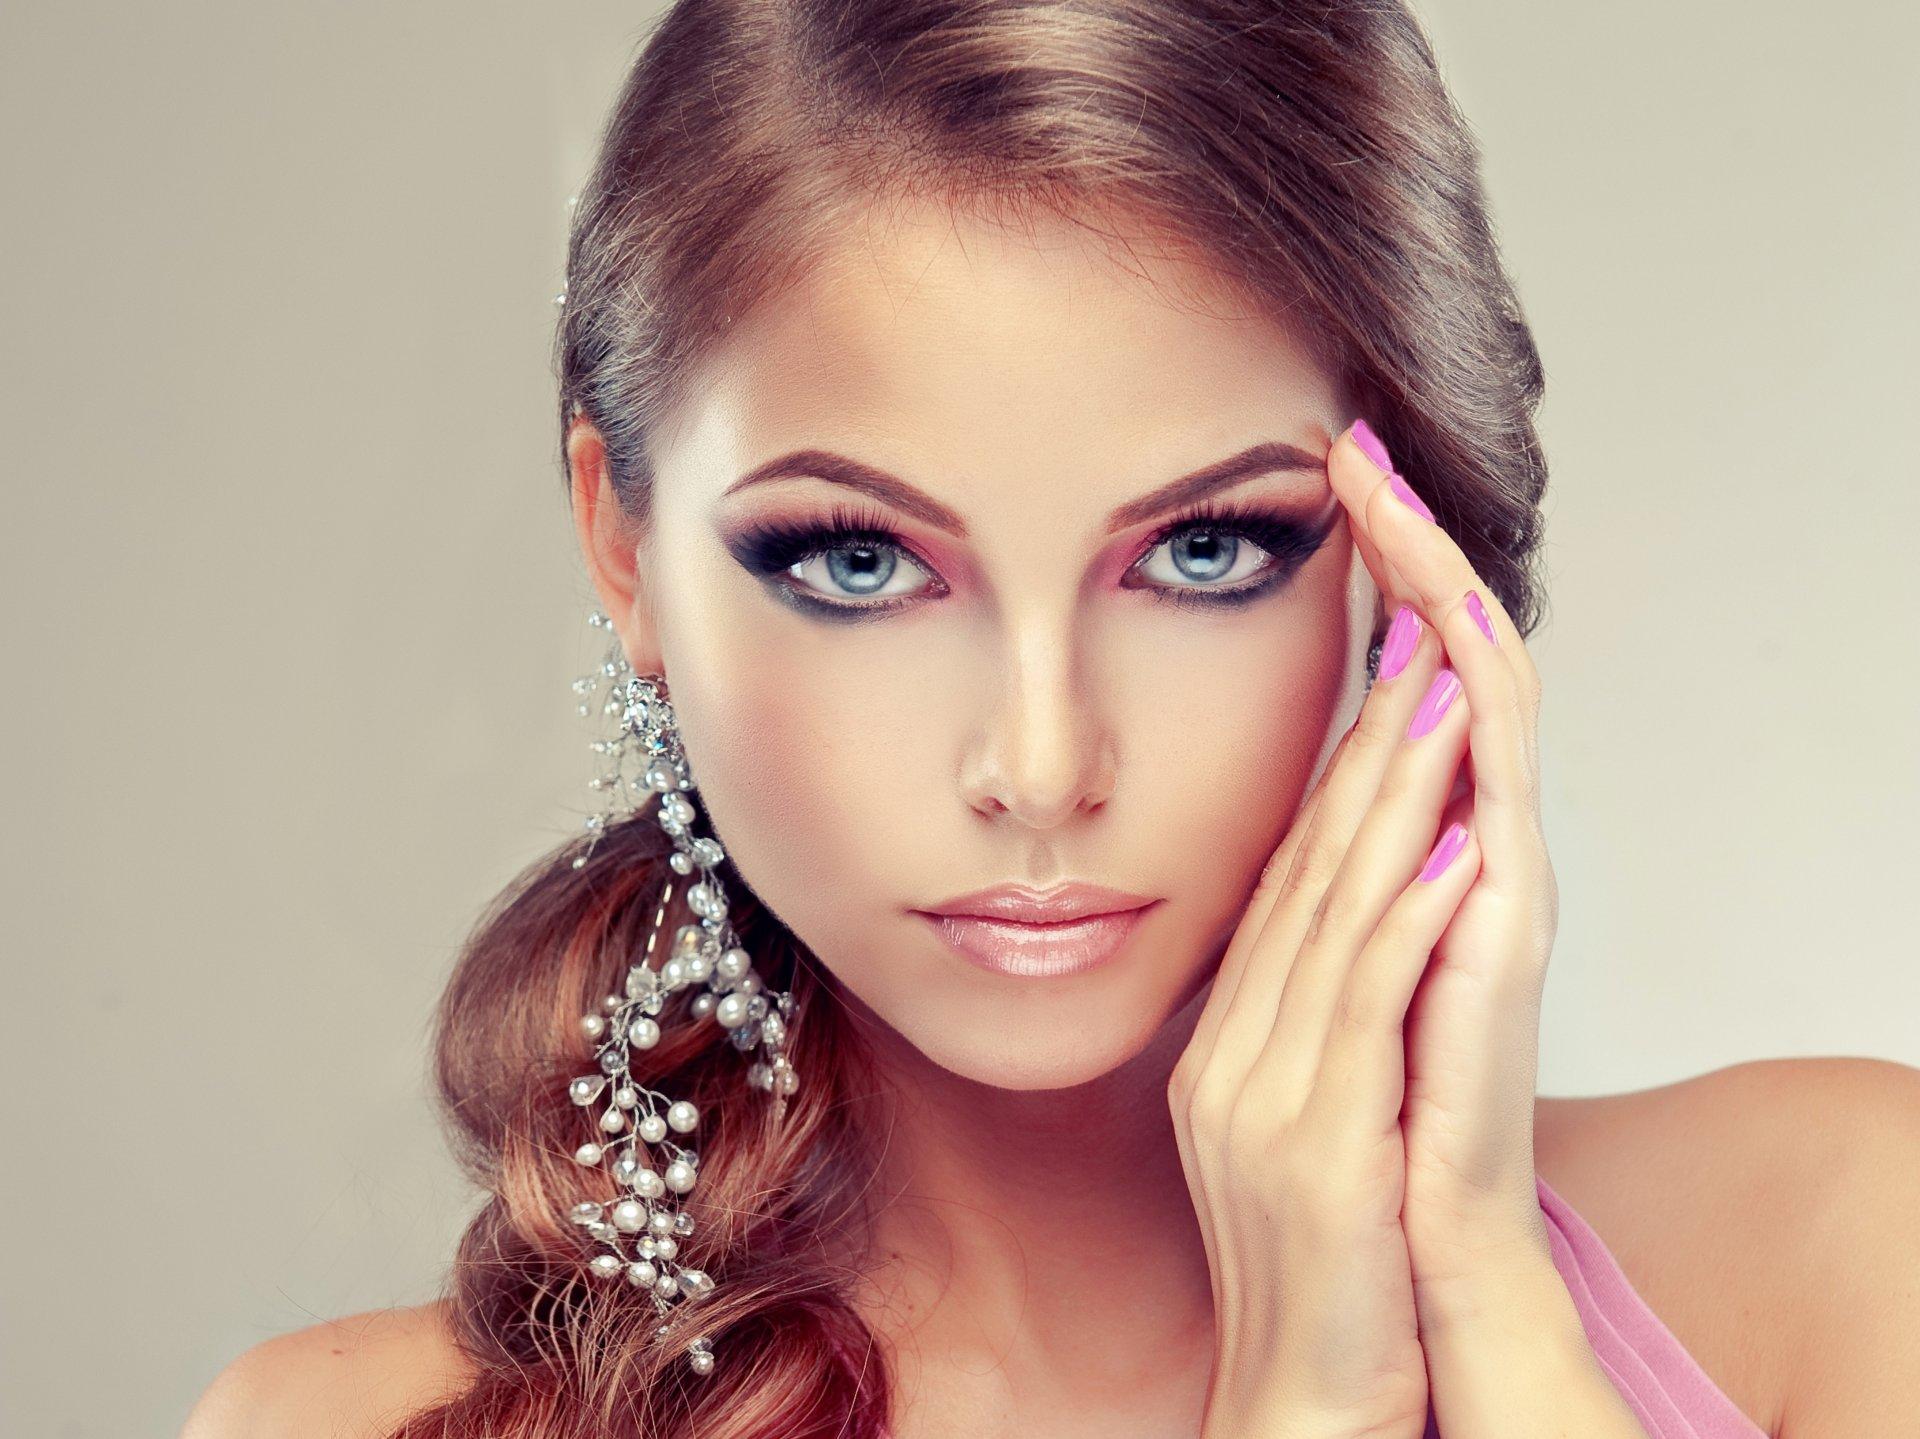 Топ-10 трендов макияжа на новый год 2021: фото-идеи и новинки